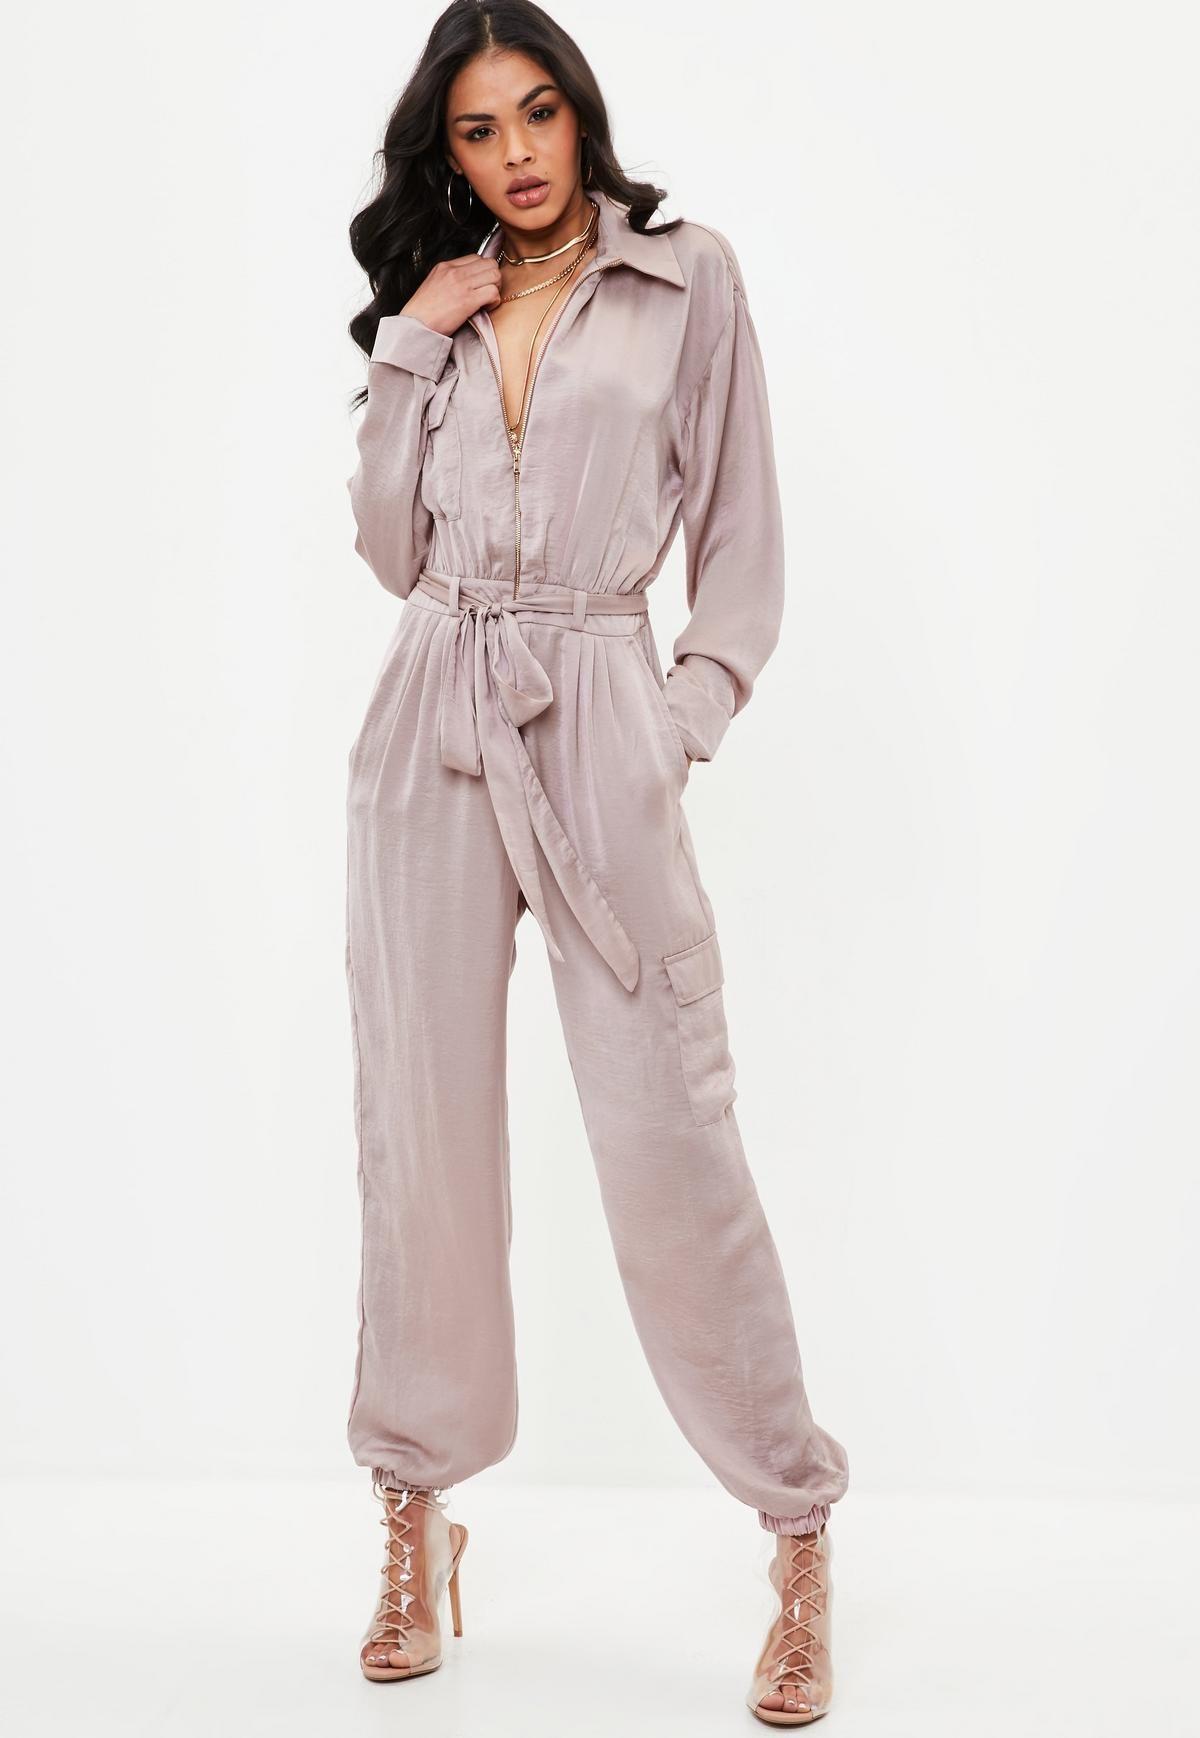 4792ed02701d Pink utility satin jumpsuit missguided style jumpsuit satin jpg 1200x1738  Mauve women satin jumpsuit